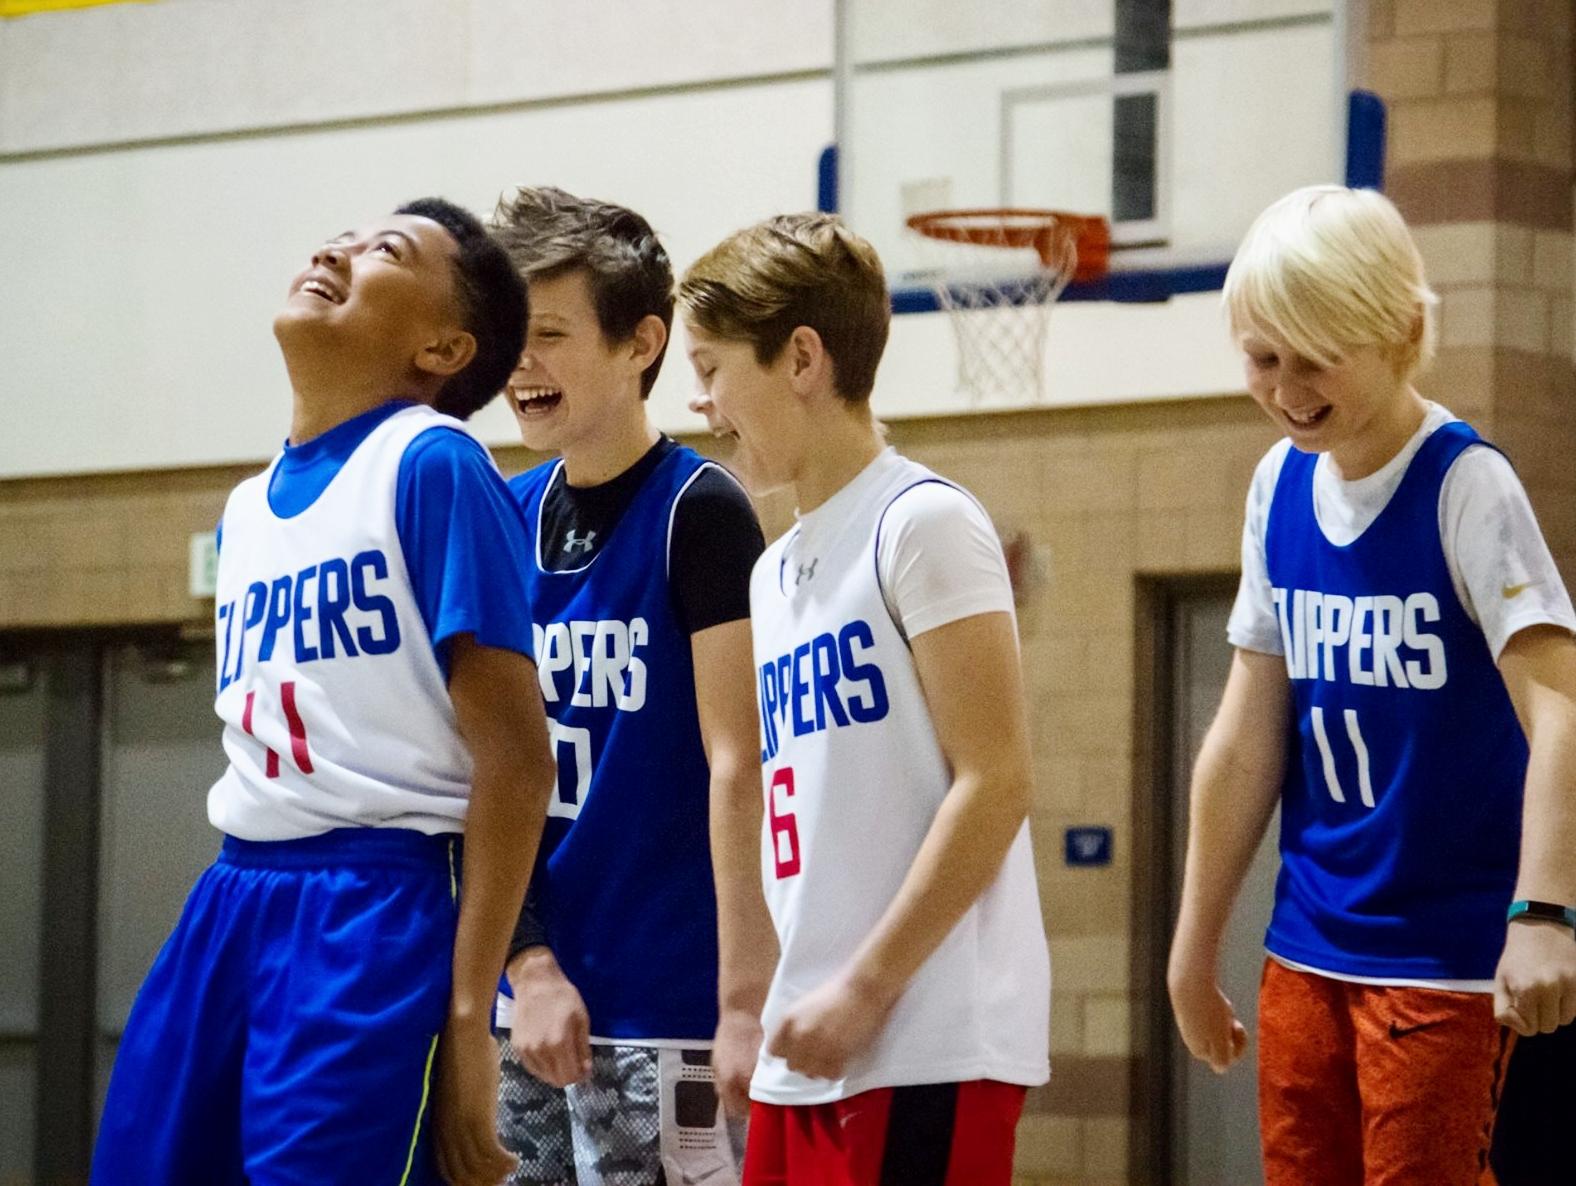 Photo: LA Clippers Youth Basketball Program